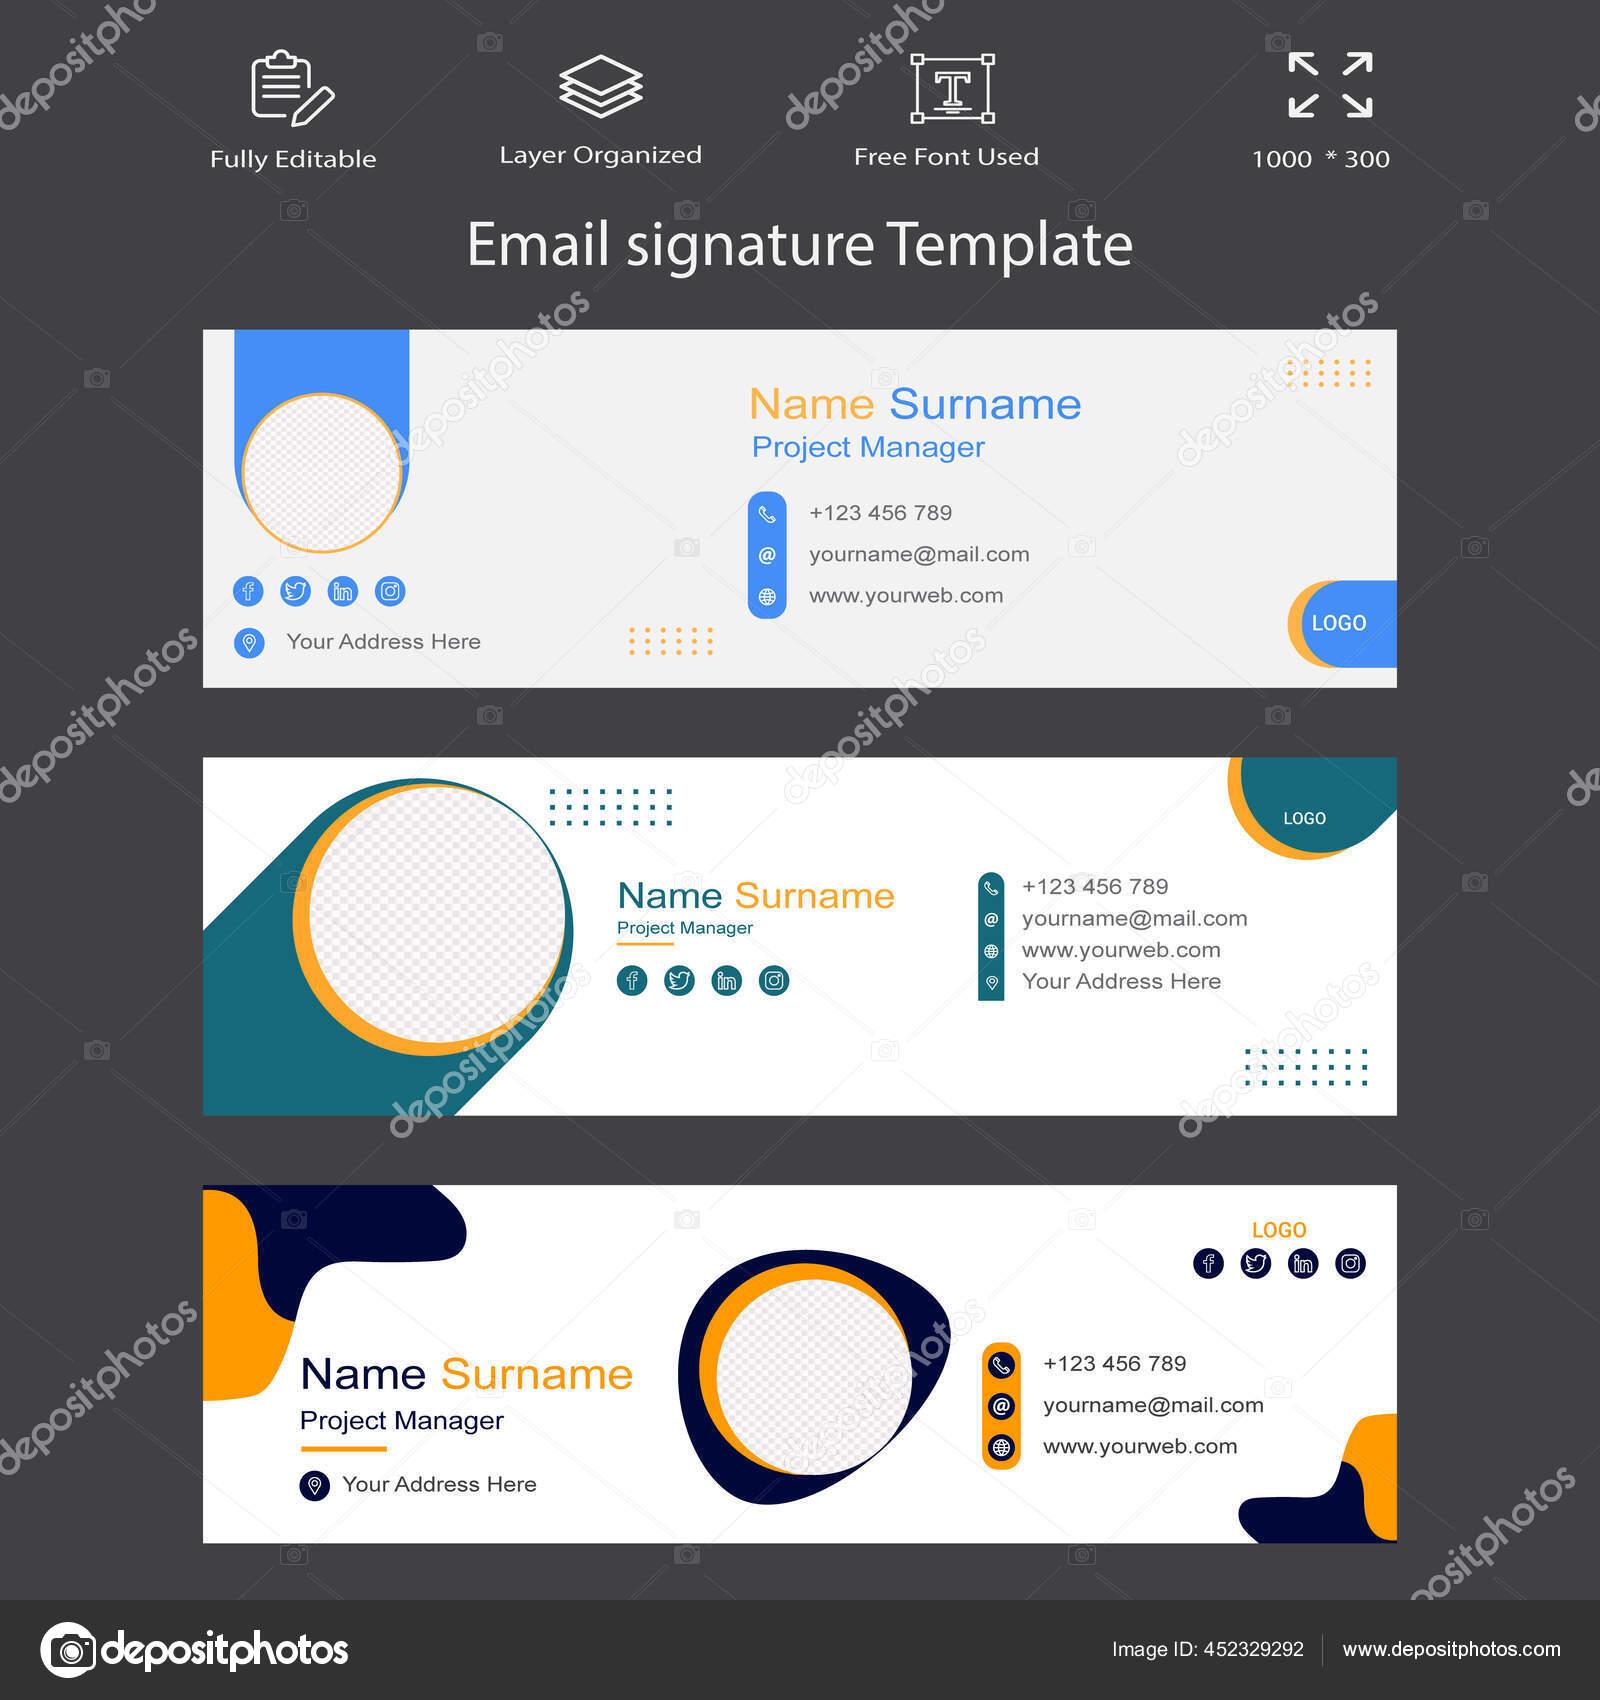 Professional Business Email Signature Template Design. Corporate Business  individual Communication idea. Modern and creative Digital Marketing ...